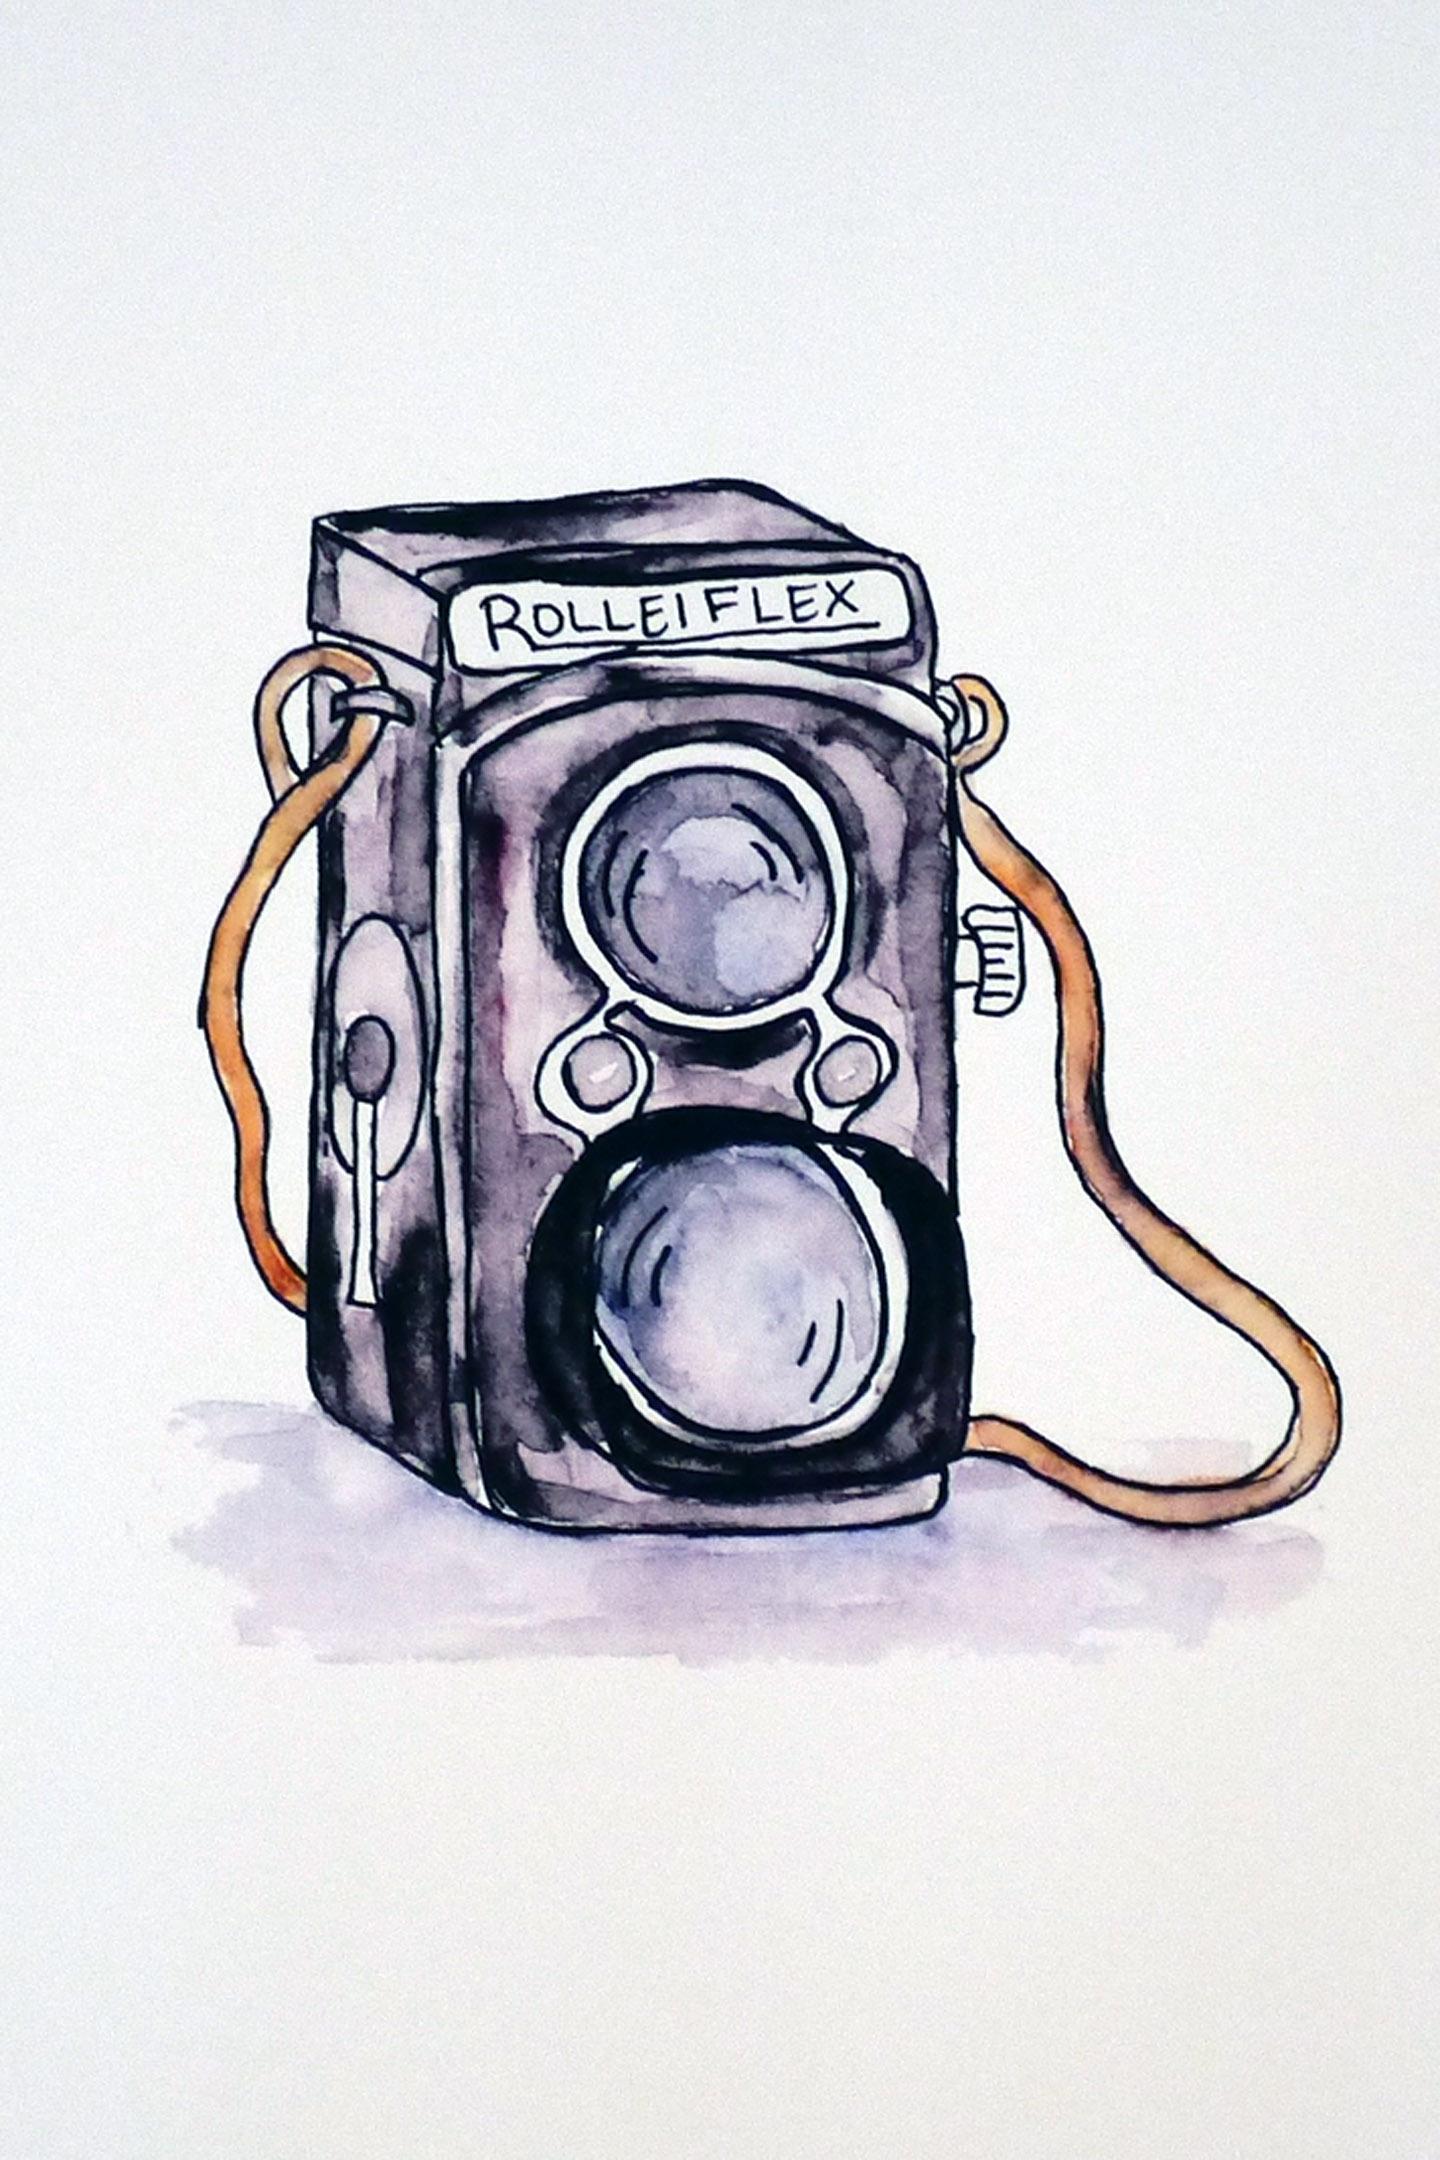 Rolleiflex zoom.jpg